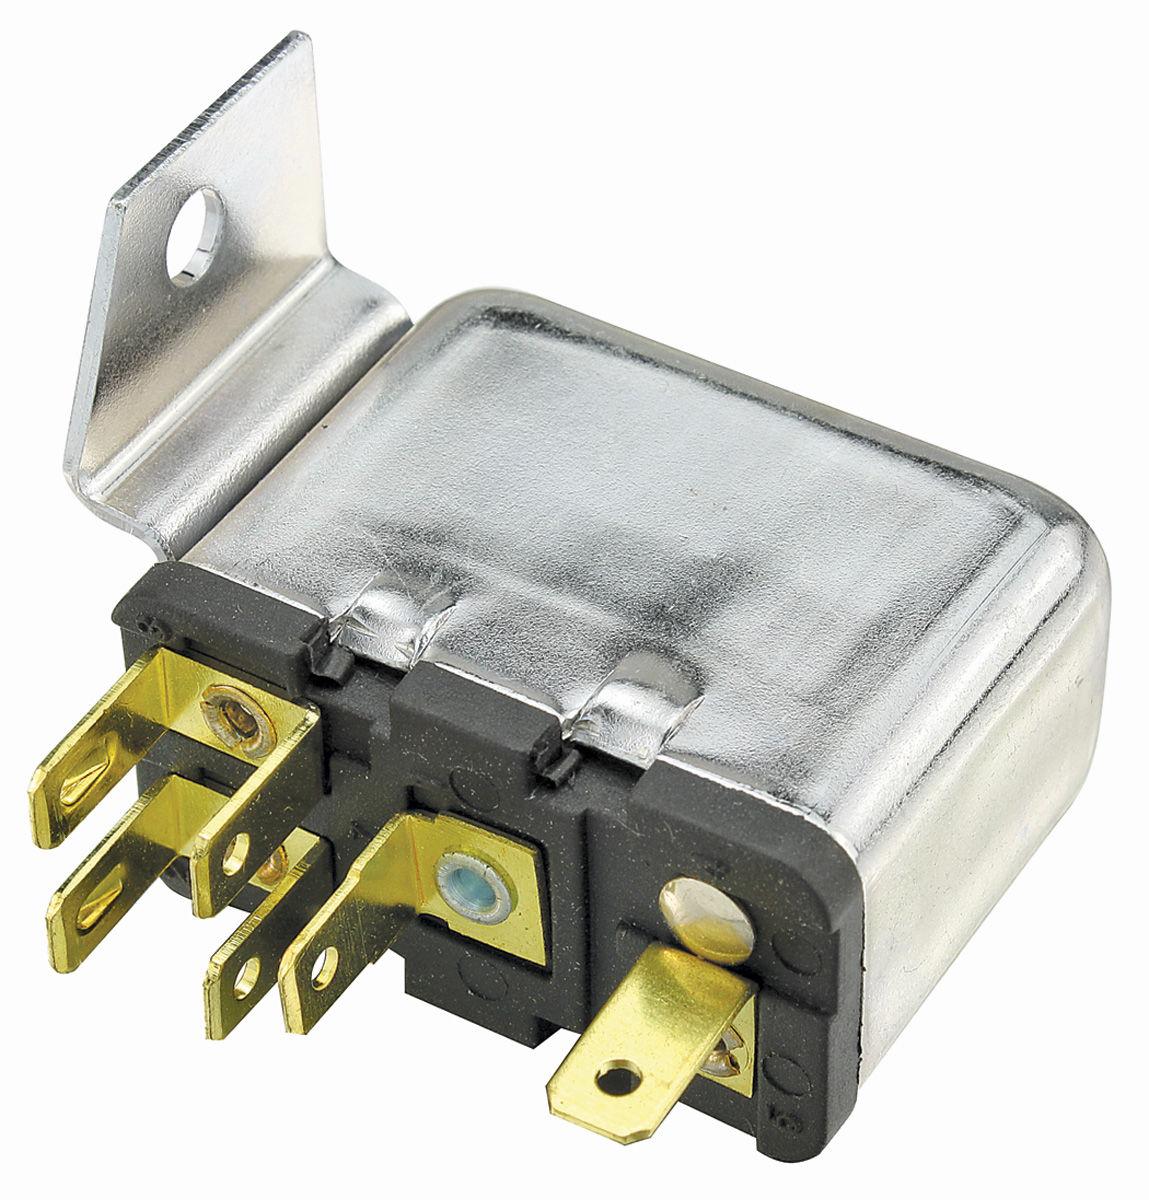 1960 76 eldorado seat relay power seat opgi com rh opgi com bmw seat wiring diagram [ 1149 x 1200 Pixel ]